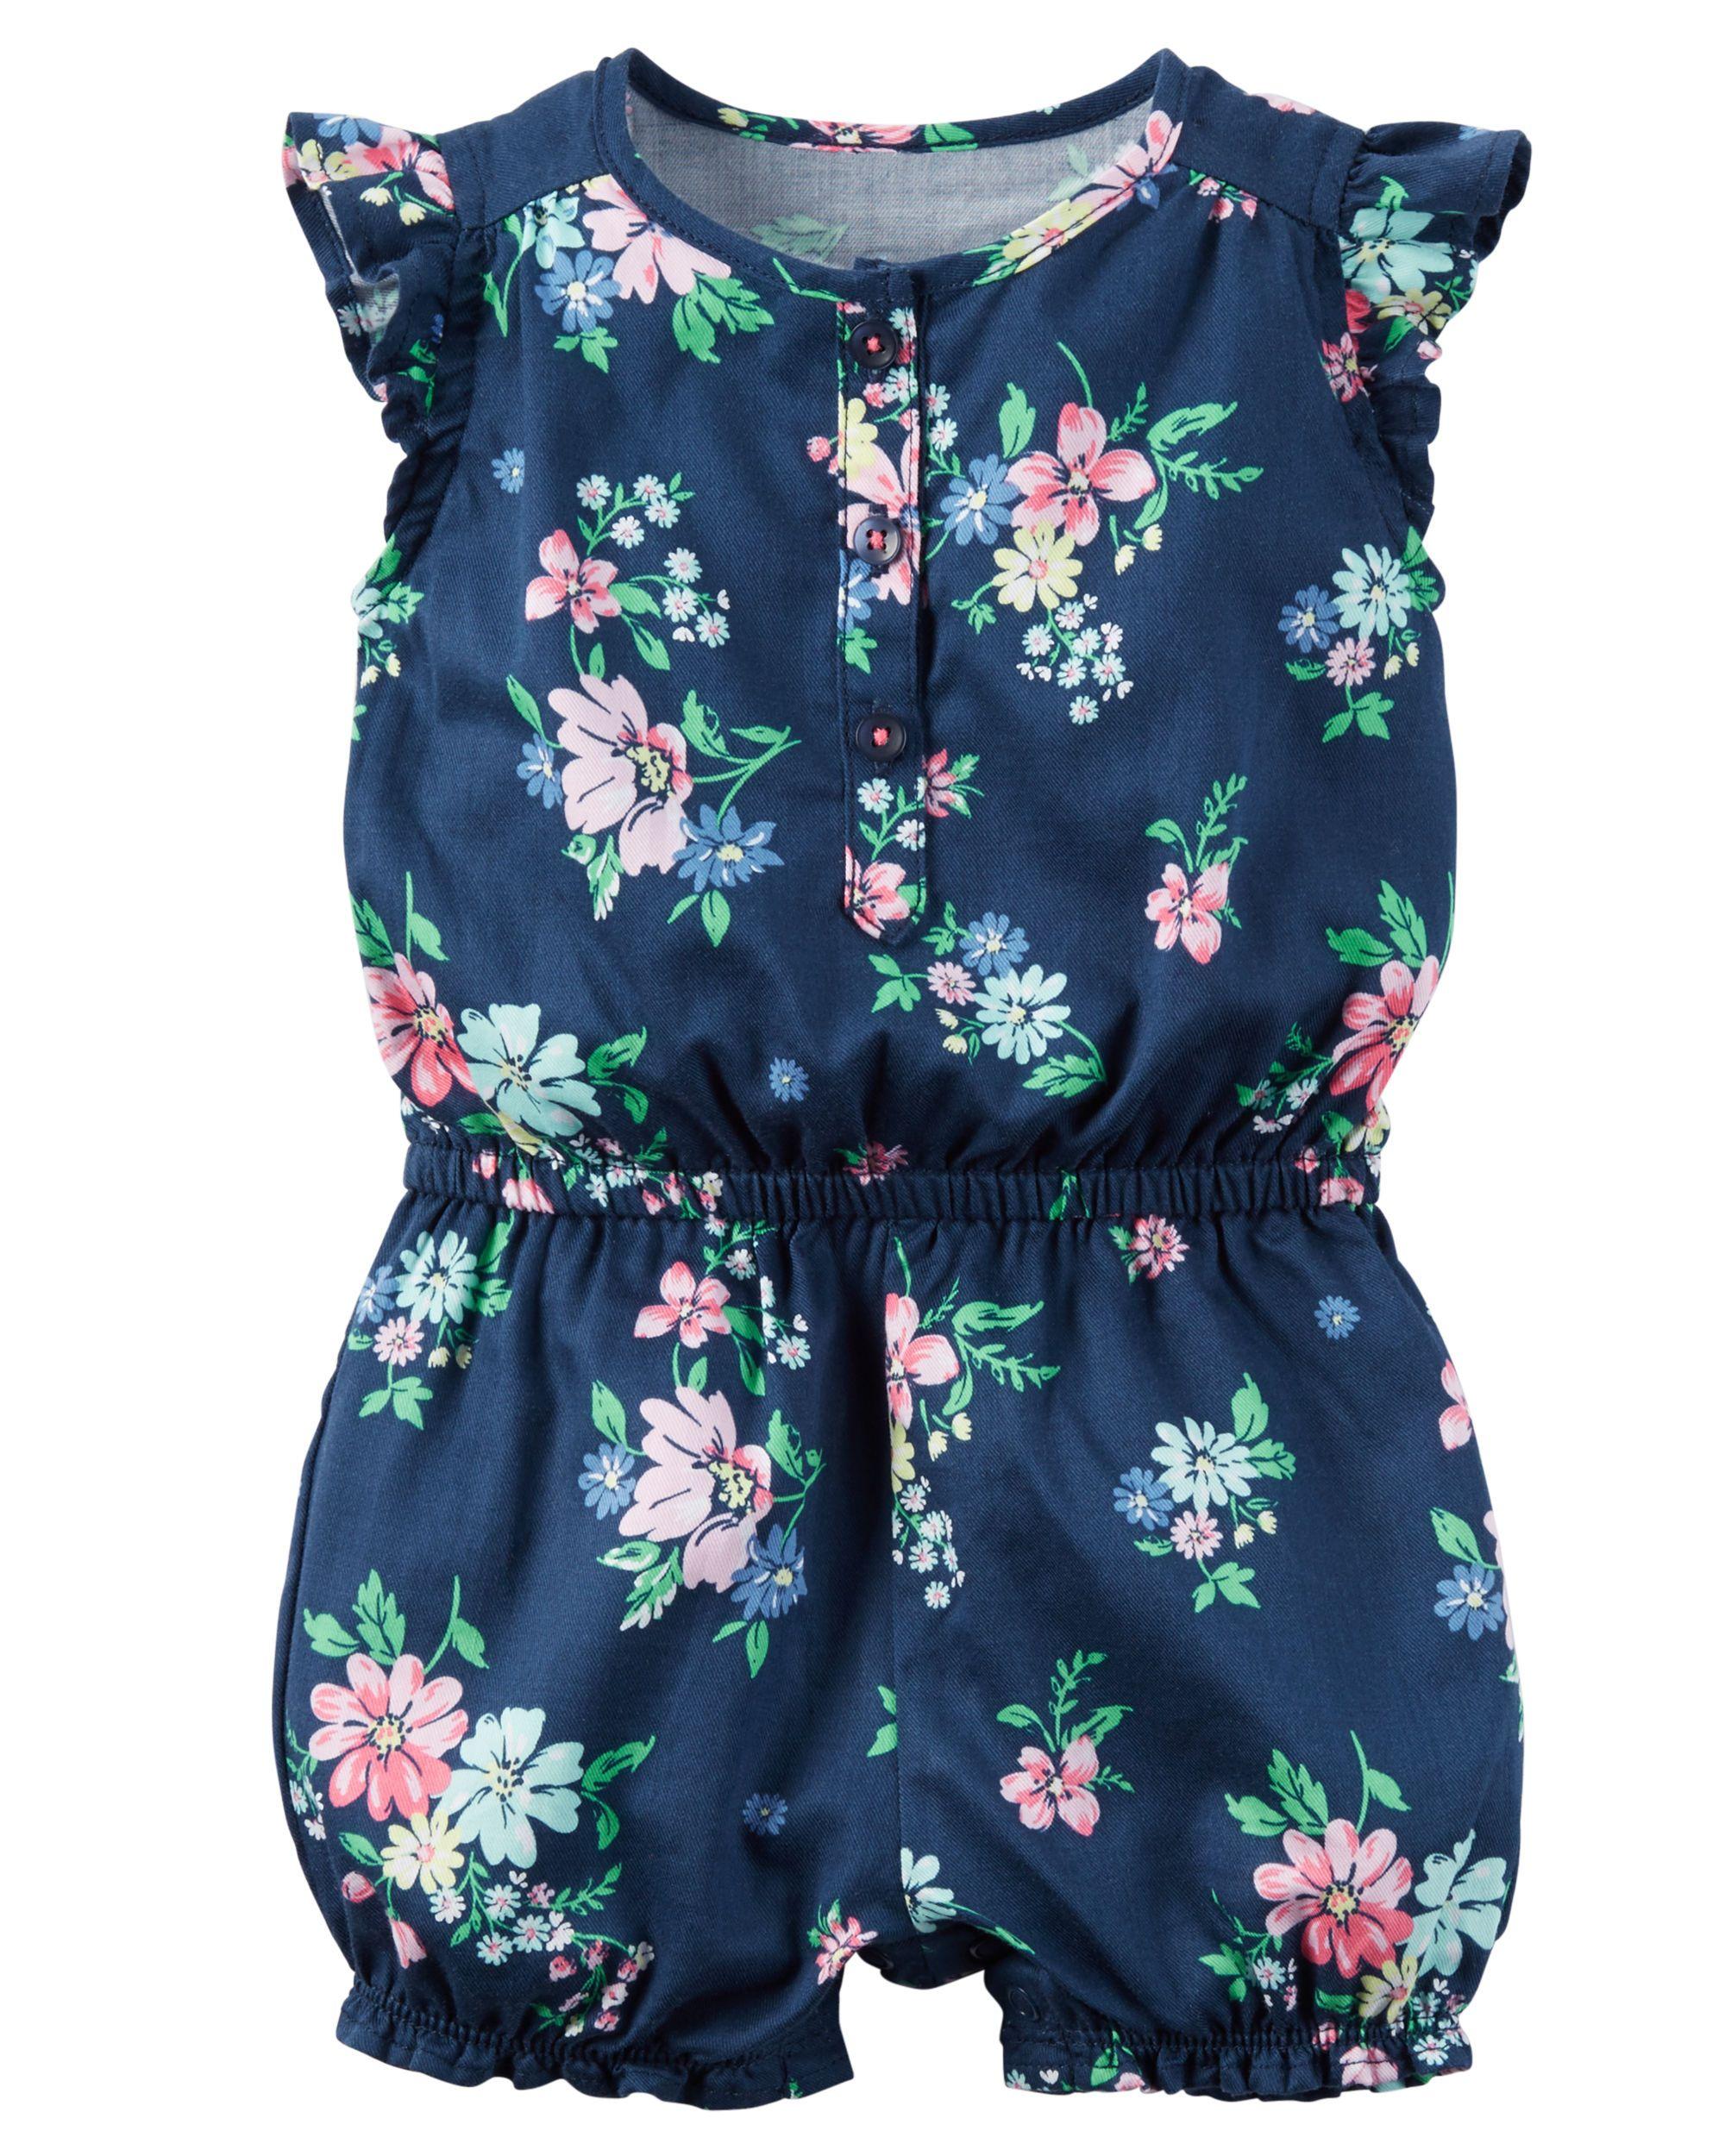 Baby Girl Floral Romper   Carters.com